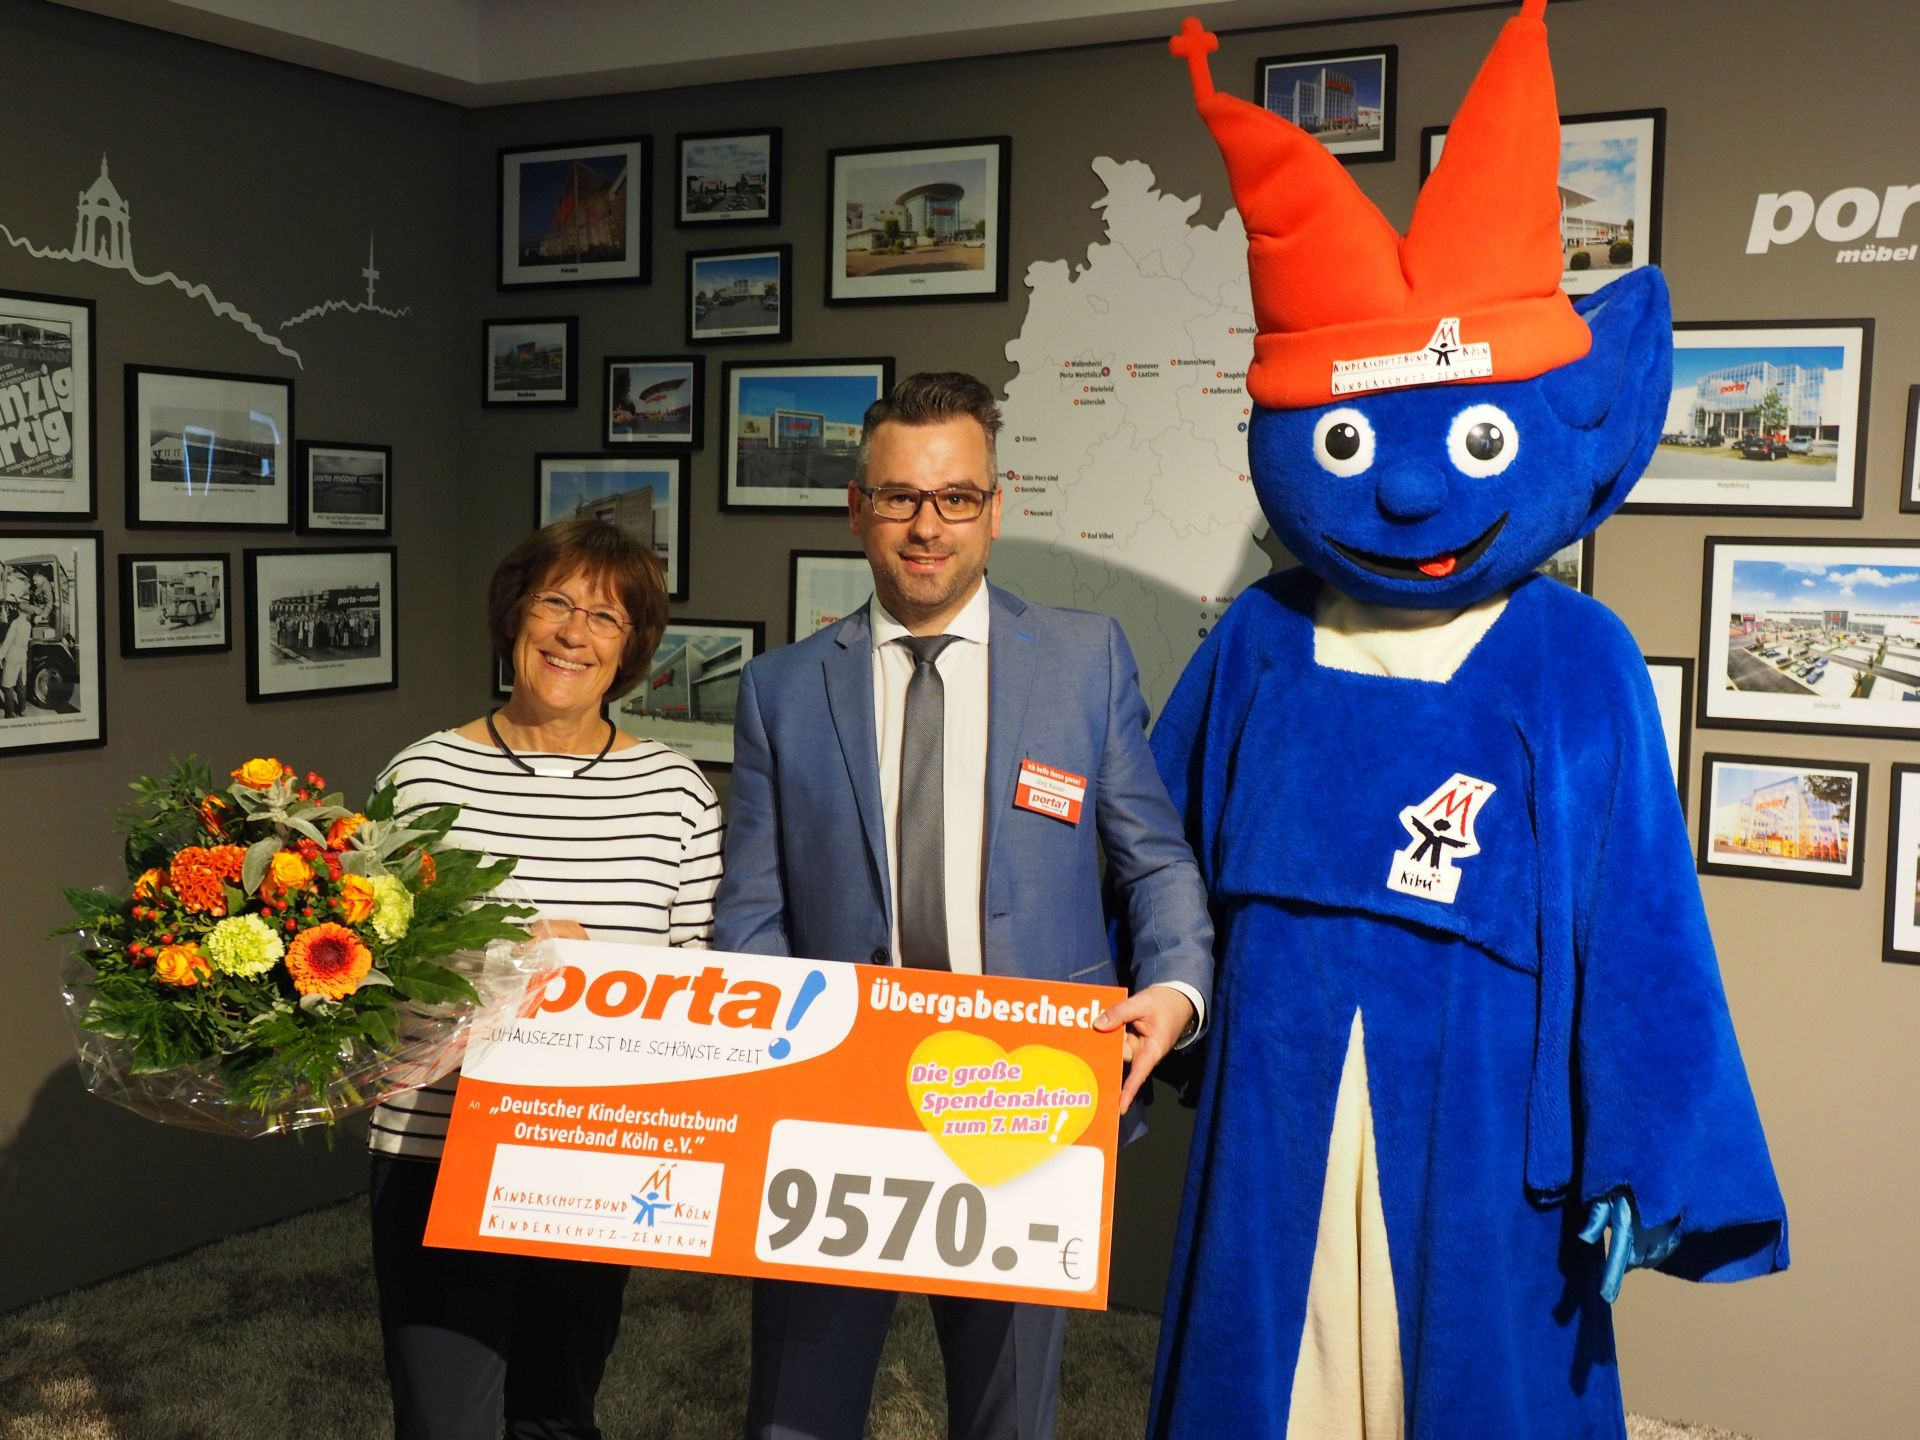 Spendenaktion Des Porta Moebelhaus Porz Lind Erloest 9570 Euro